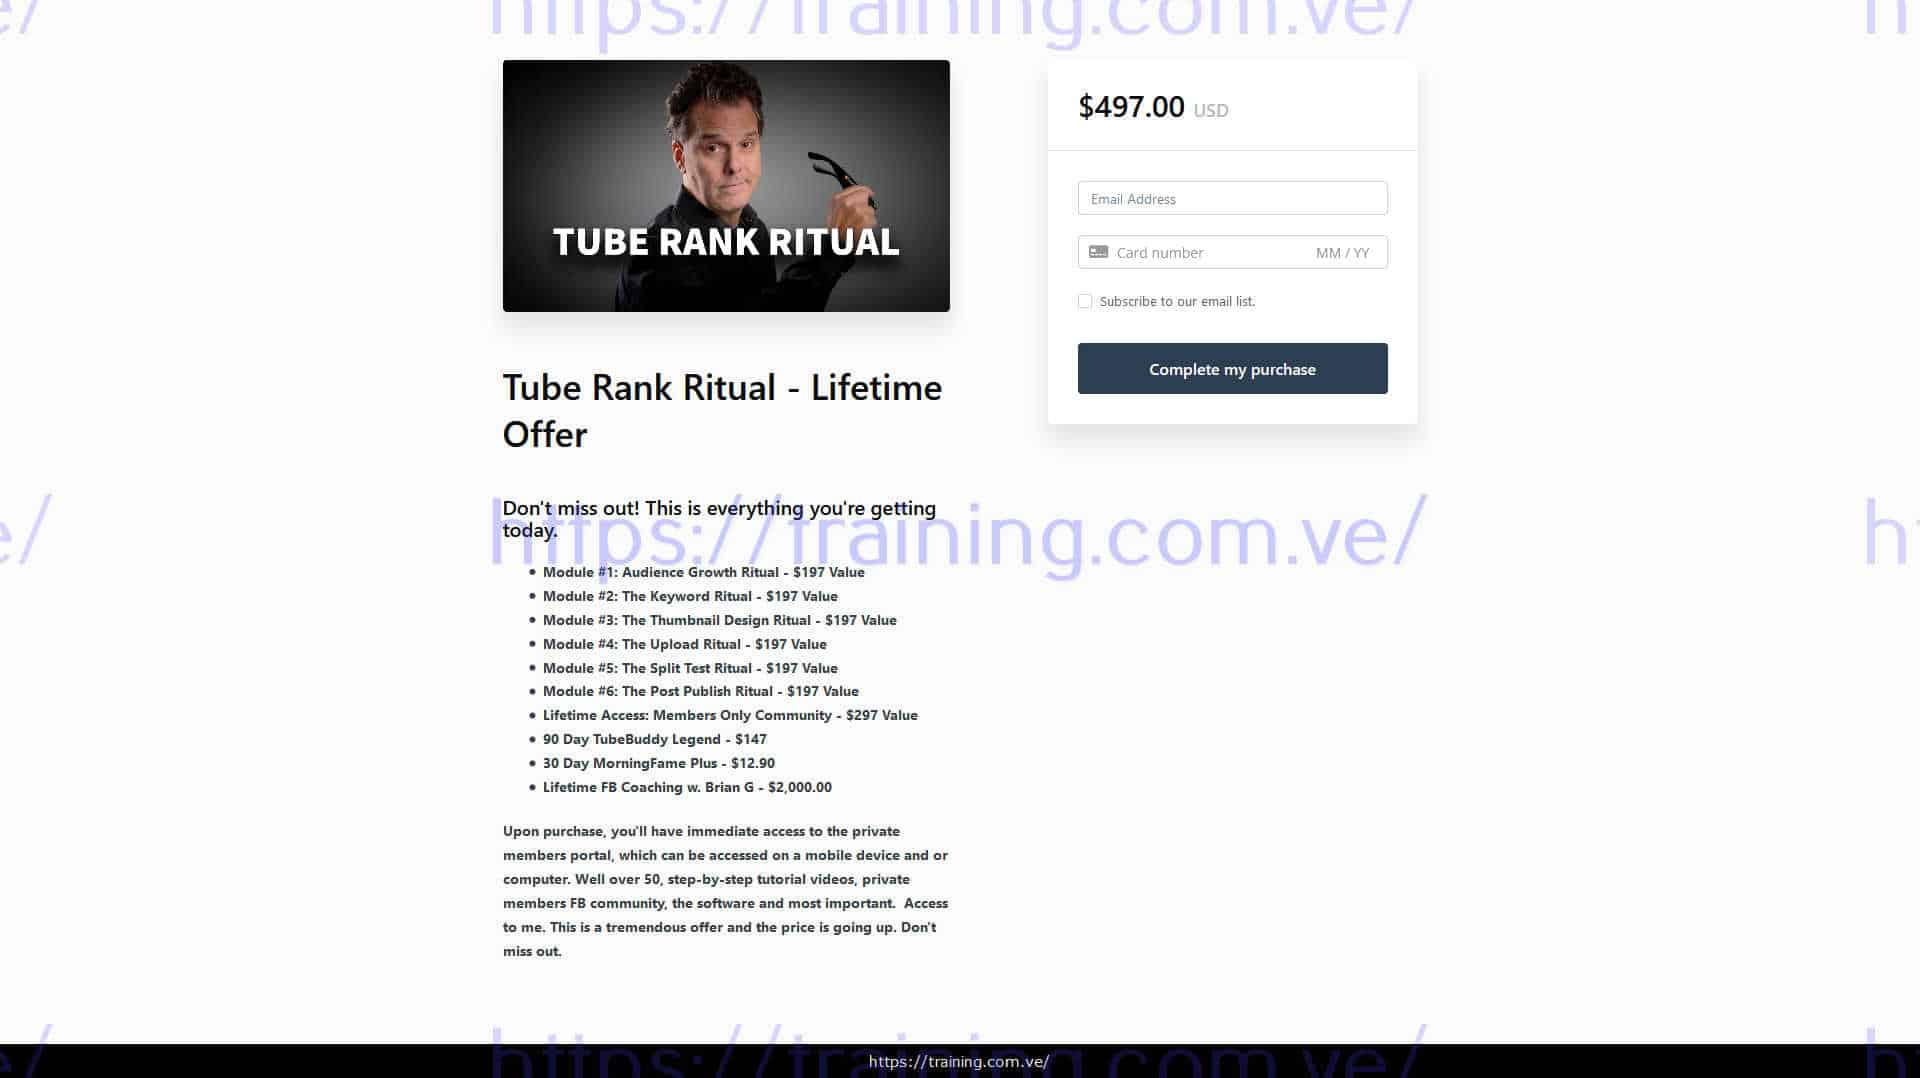 Tube Rank Ritual by Brian G Johnson Buy